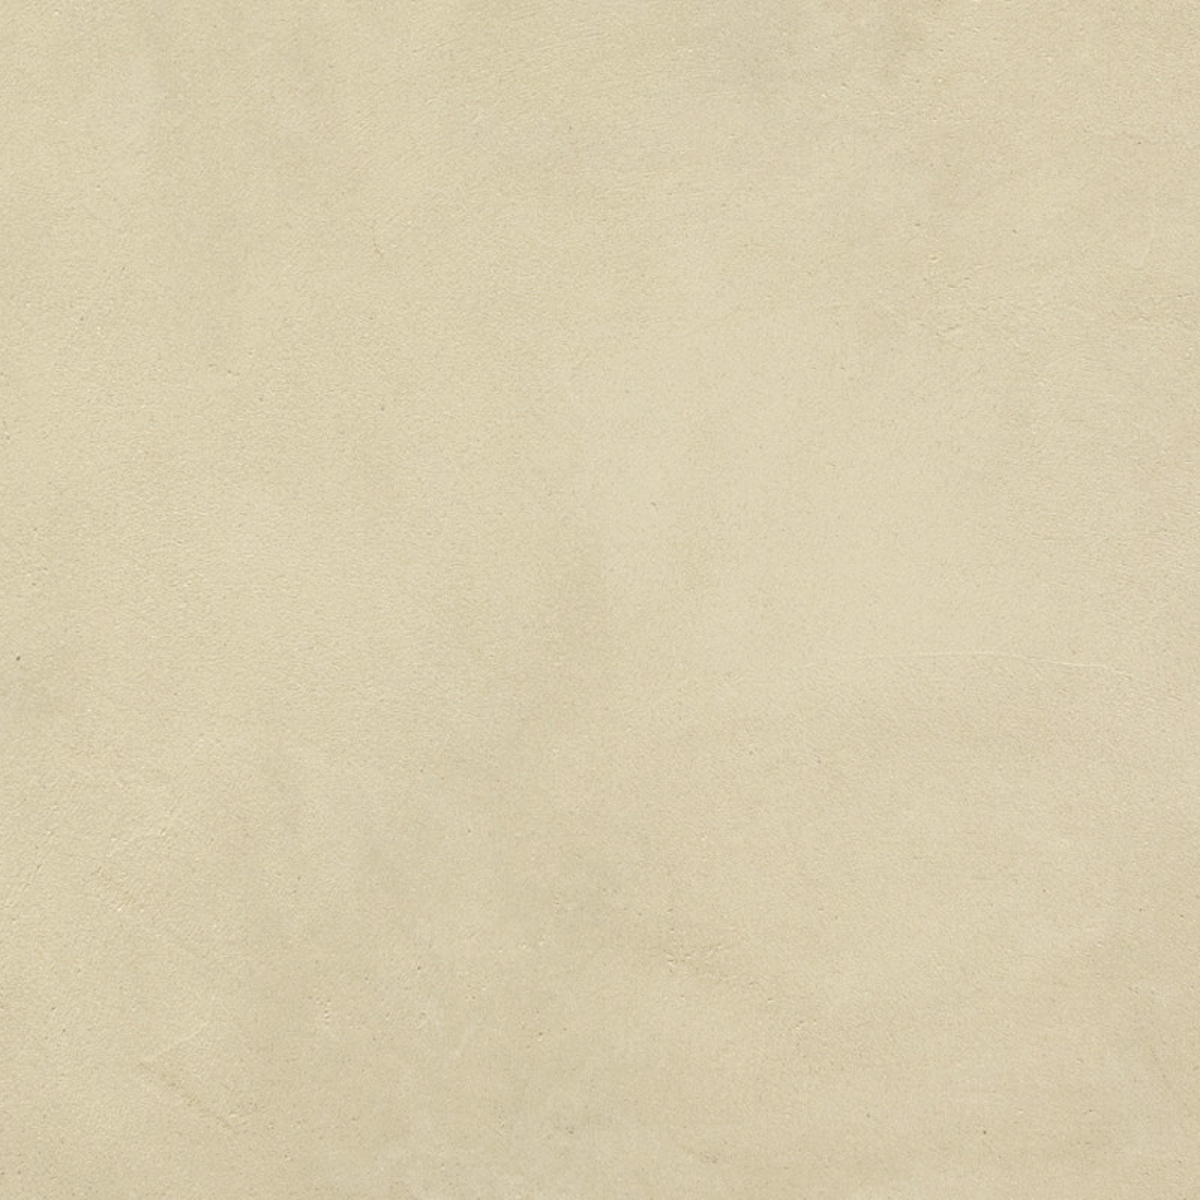 B ton cir sur carrelage cuisine salle de bain mural sol - Beton cire sur carrelage mural cuisine ...